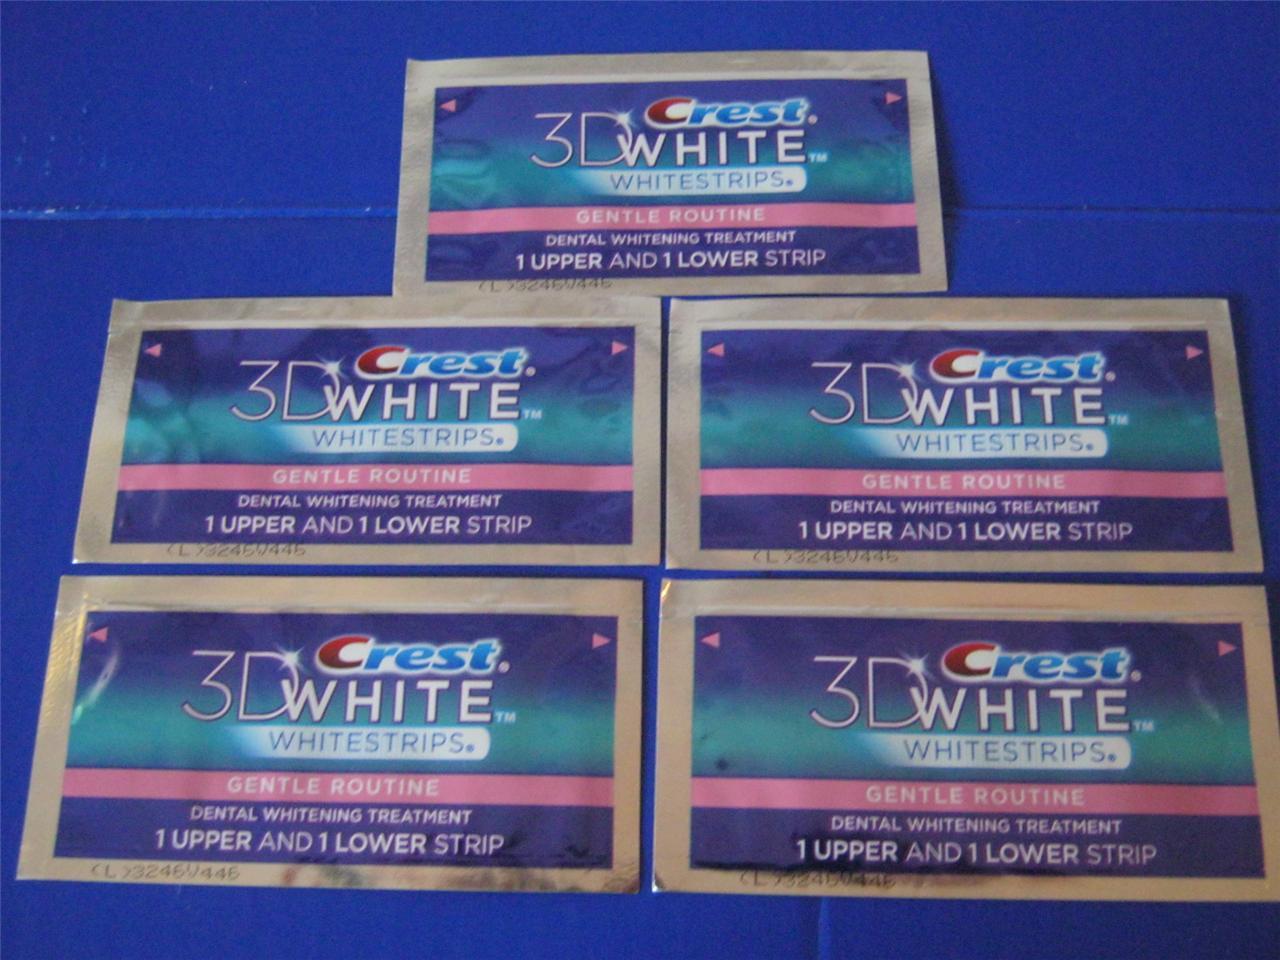 Crest-3D-Gentle-Routine-Sensitive-Professional-Whitestrips-Teeth-Whitening-Strip